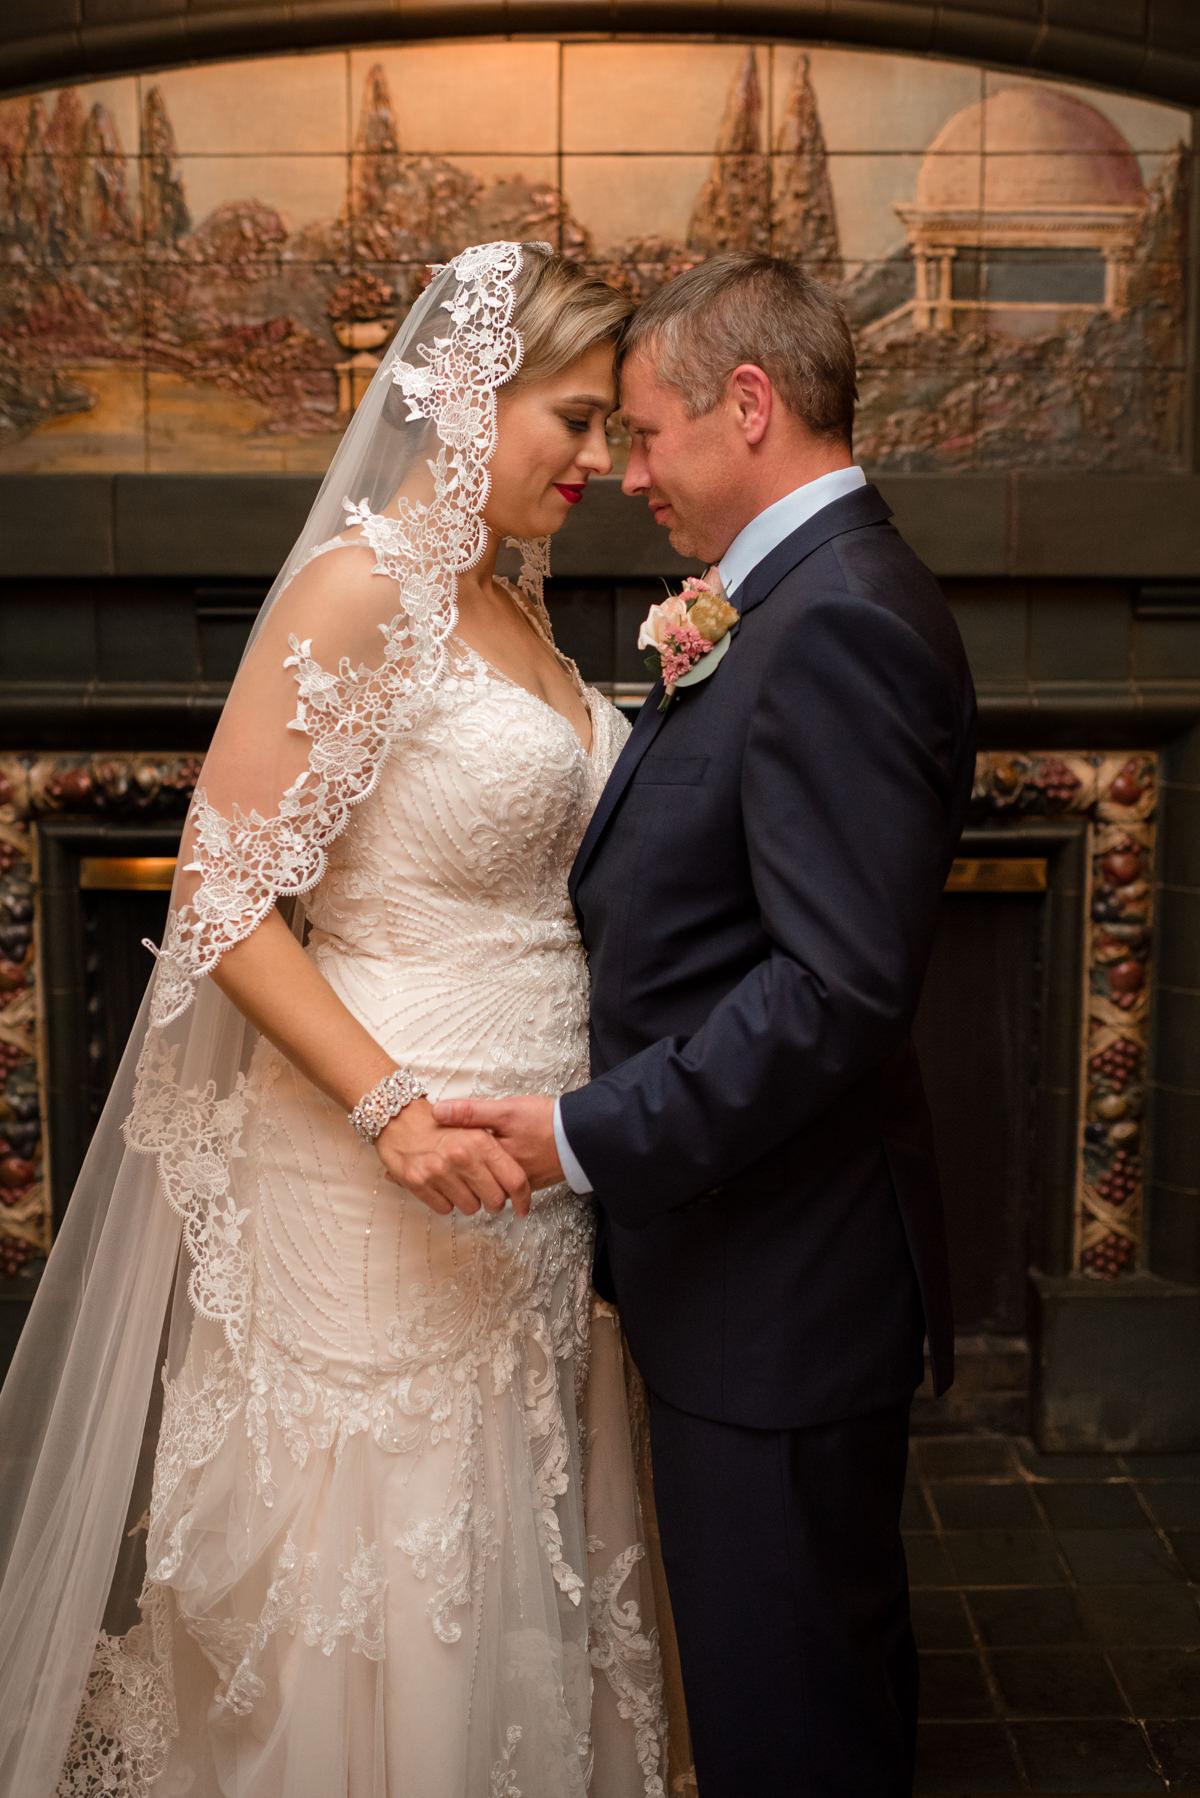 Andrew Tat - Documentary Wedding Photography - Hotel Sorrento - Seattle, Washington -Jessica & Paul - 25.jpg